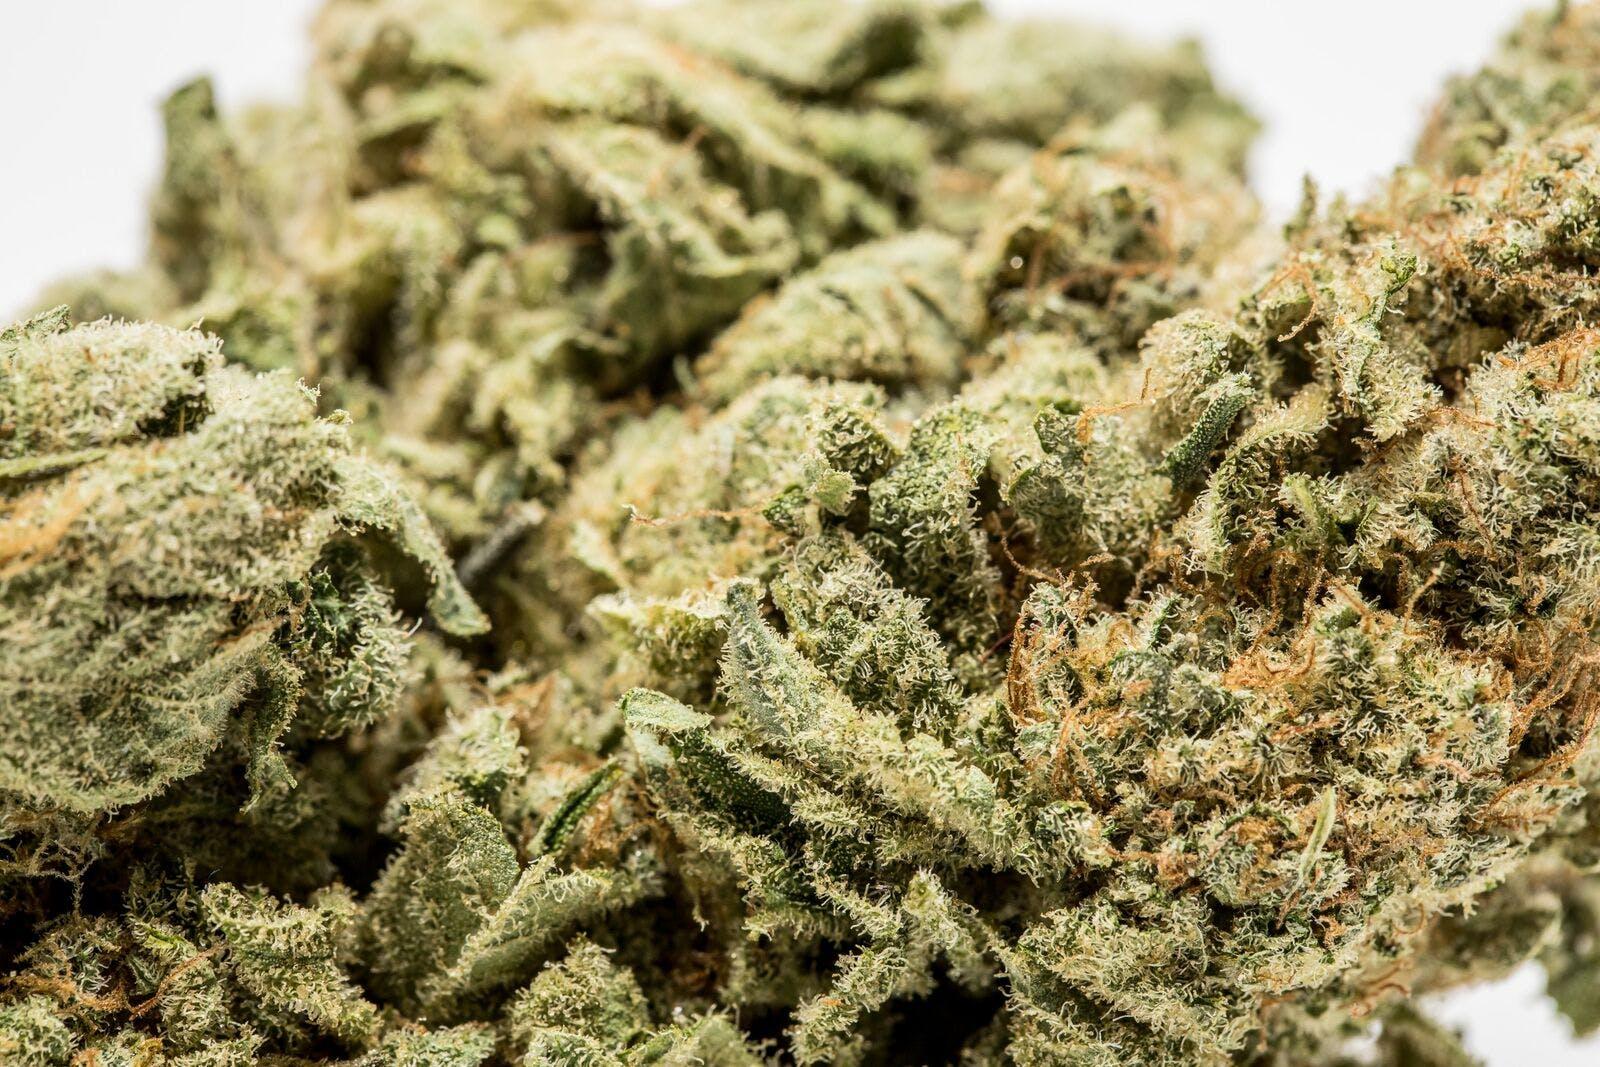 Fruit Punch Weed; Fruit Punch Cannabis Strain; Fruit Punch Sativa Marijuana Strain